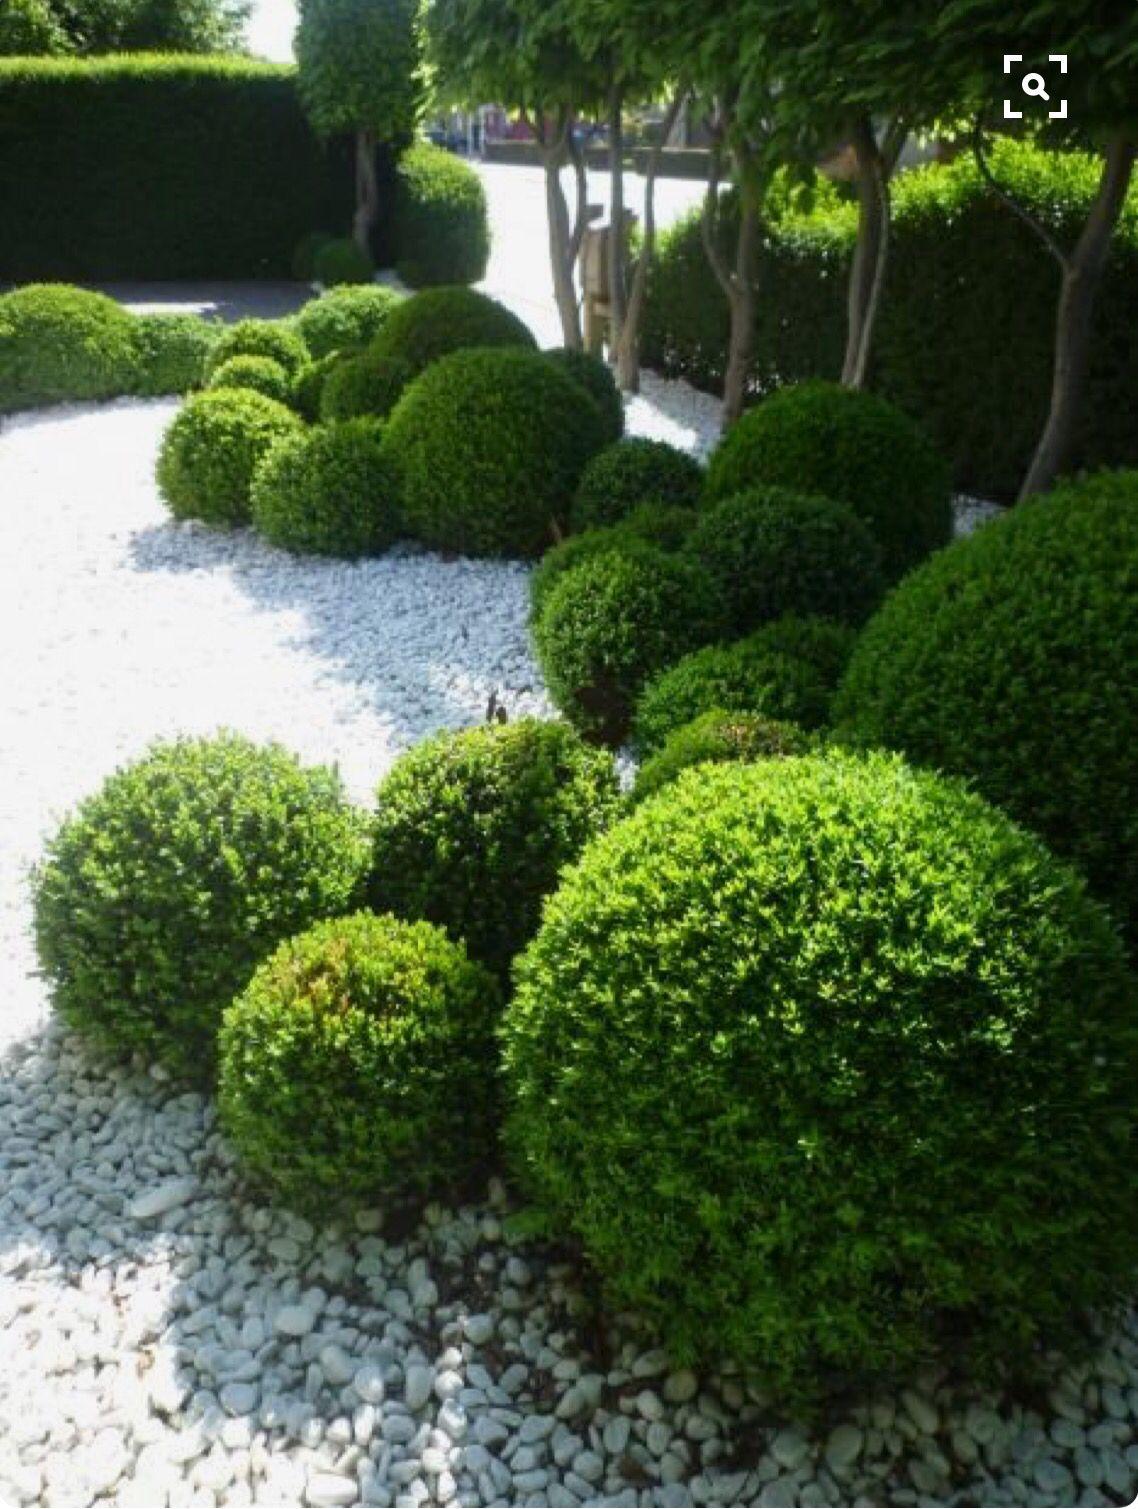 Balls Of Topiary In A Modern Minimalist Garden Design